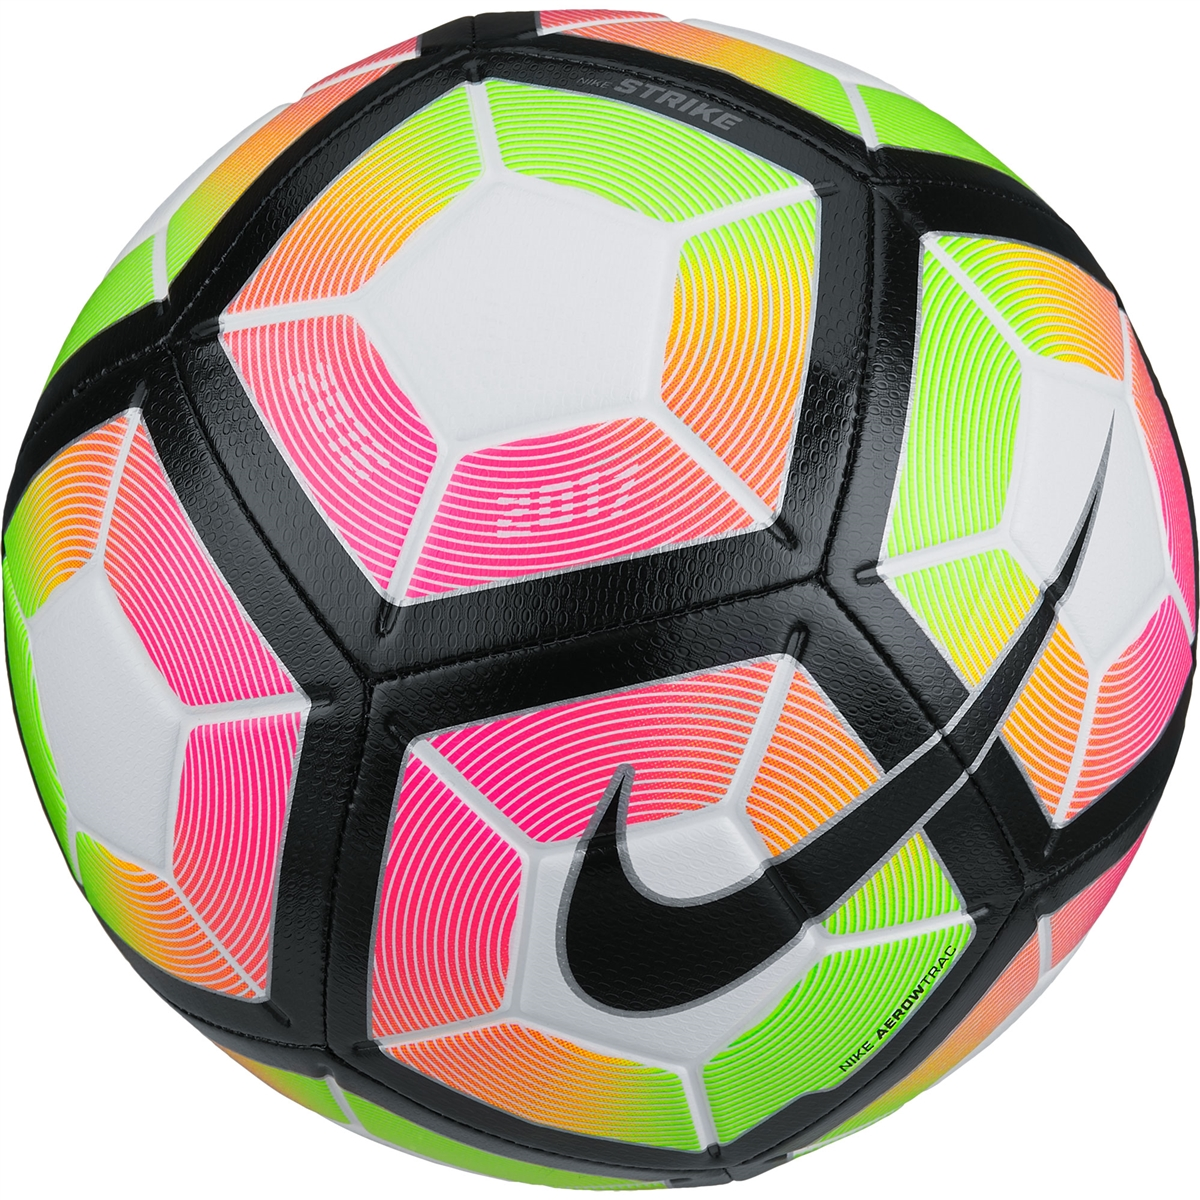 1200x1200 Nike Strike Soccer Ball (Whitepink Blastlack) Nike Soccer